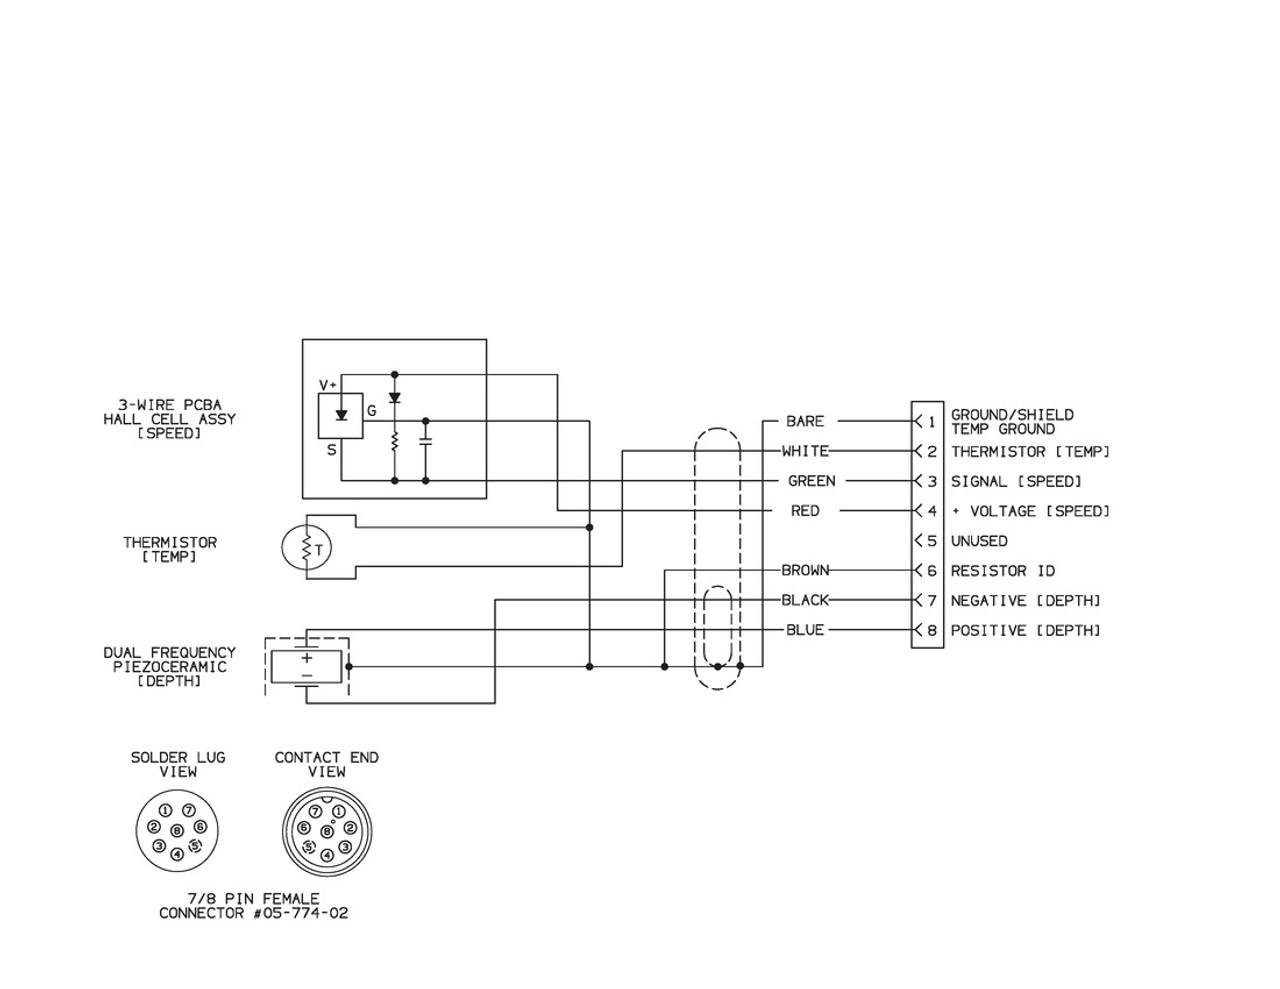 medium resolution of airmar wiring diagram garmin p66 600w s d t blue bottle marine